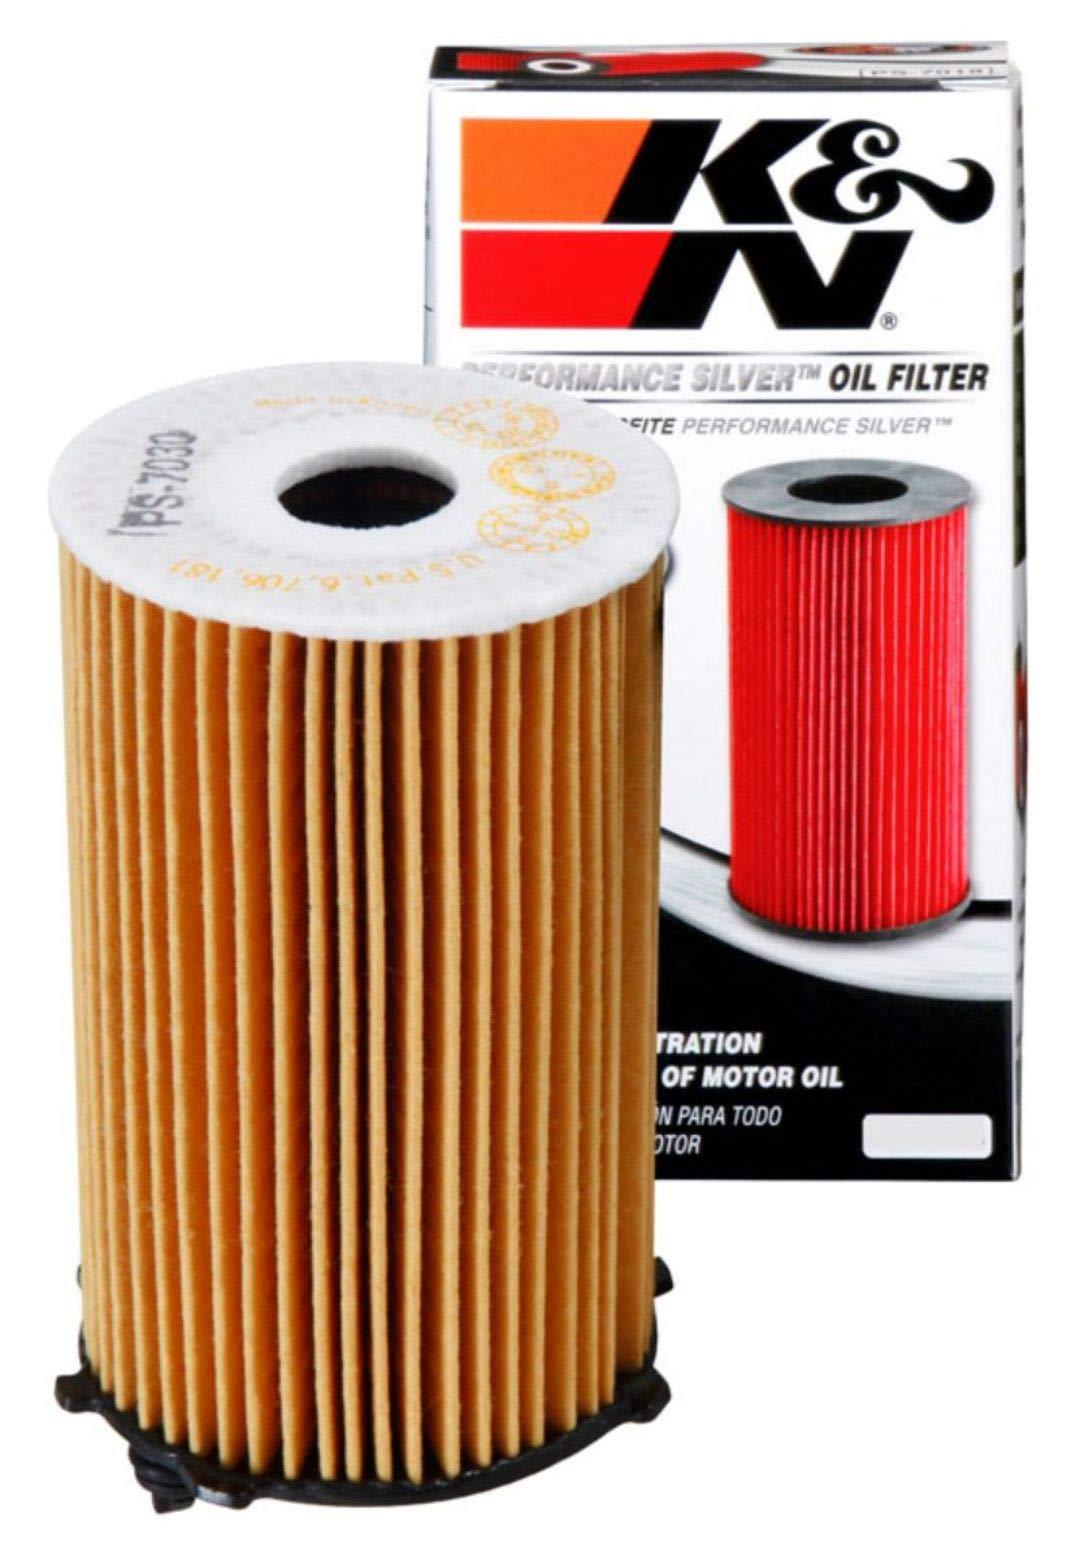 K&N Premium Oil Filter: Designed to Protect your Engine: Fits Select 2010-2019 KIA/HYUNDAI (Sedona, Sorento, Cadenza, K7, Azera, Santa Fe, XL), PS-7030, Multi